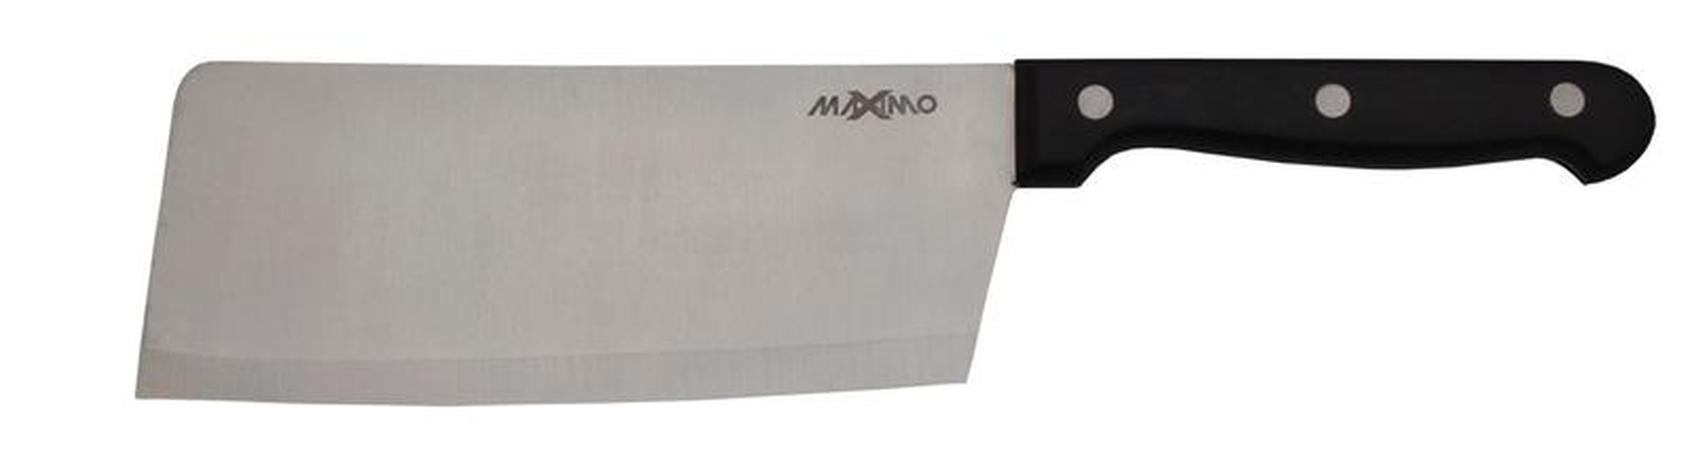 Maximo | Sekáček na maso, 15,2 cm